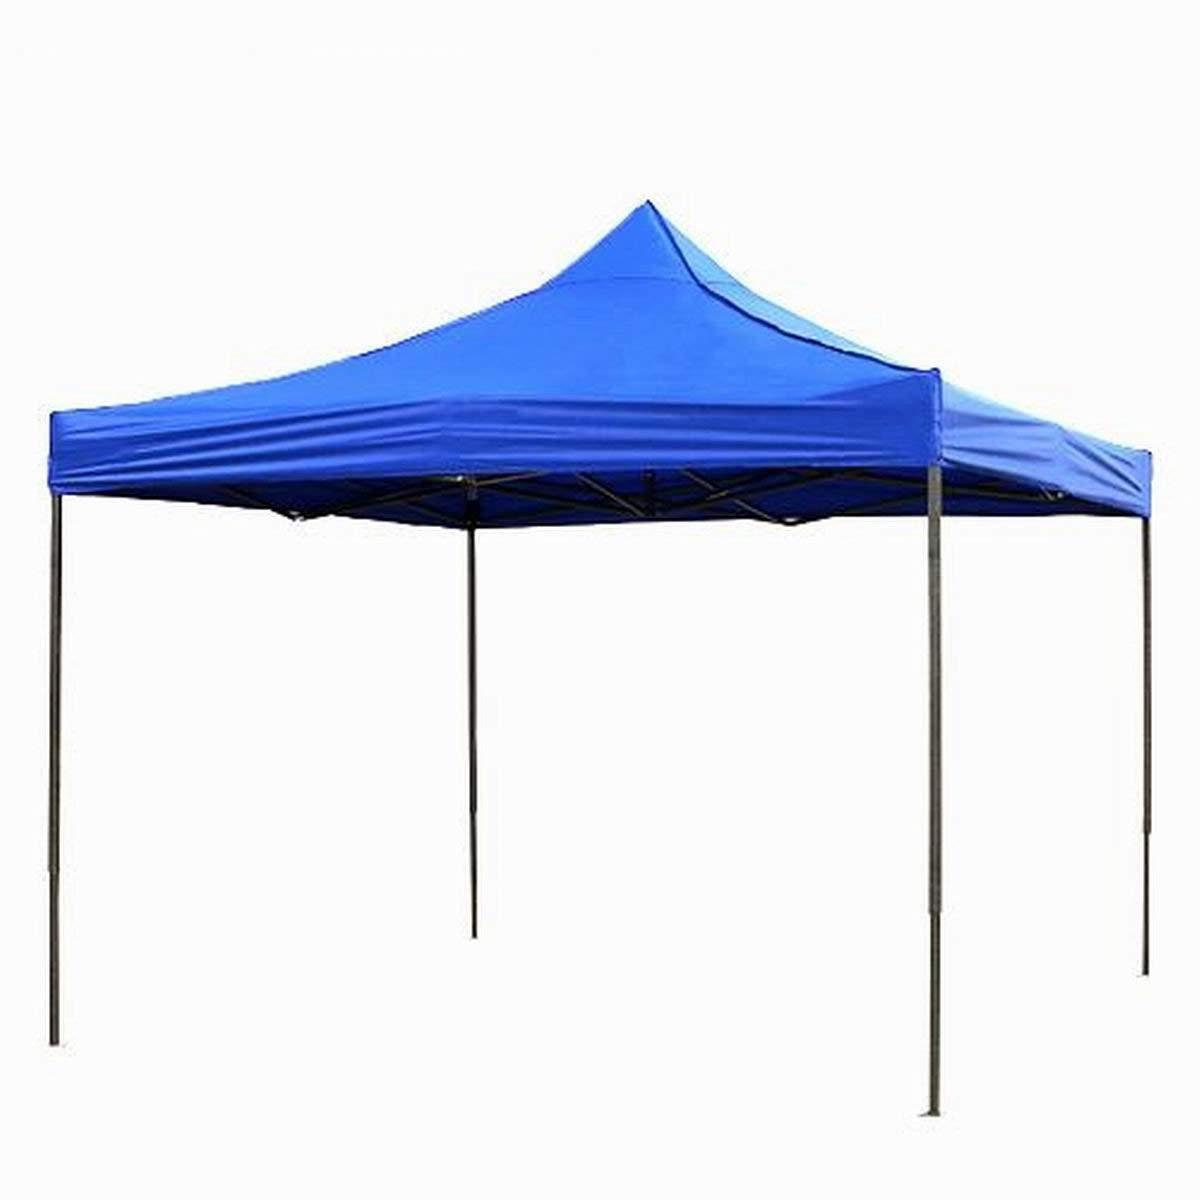 portable gazebo amazon.com : qisan folding canopy lightweight gazebos outdoor pop up  portable NYIELRR